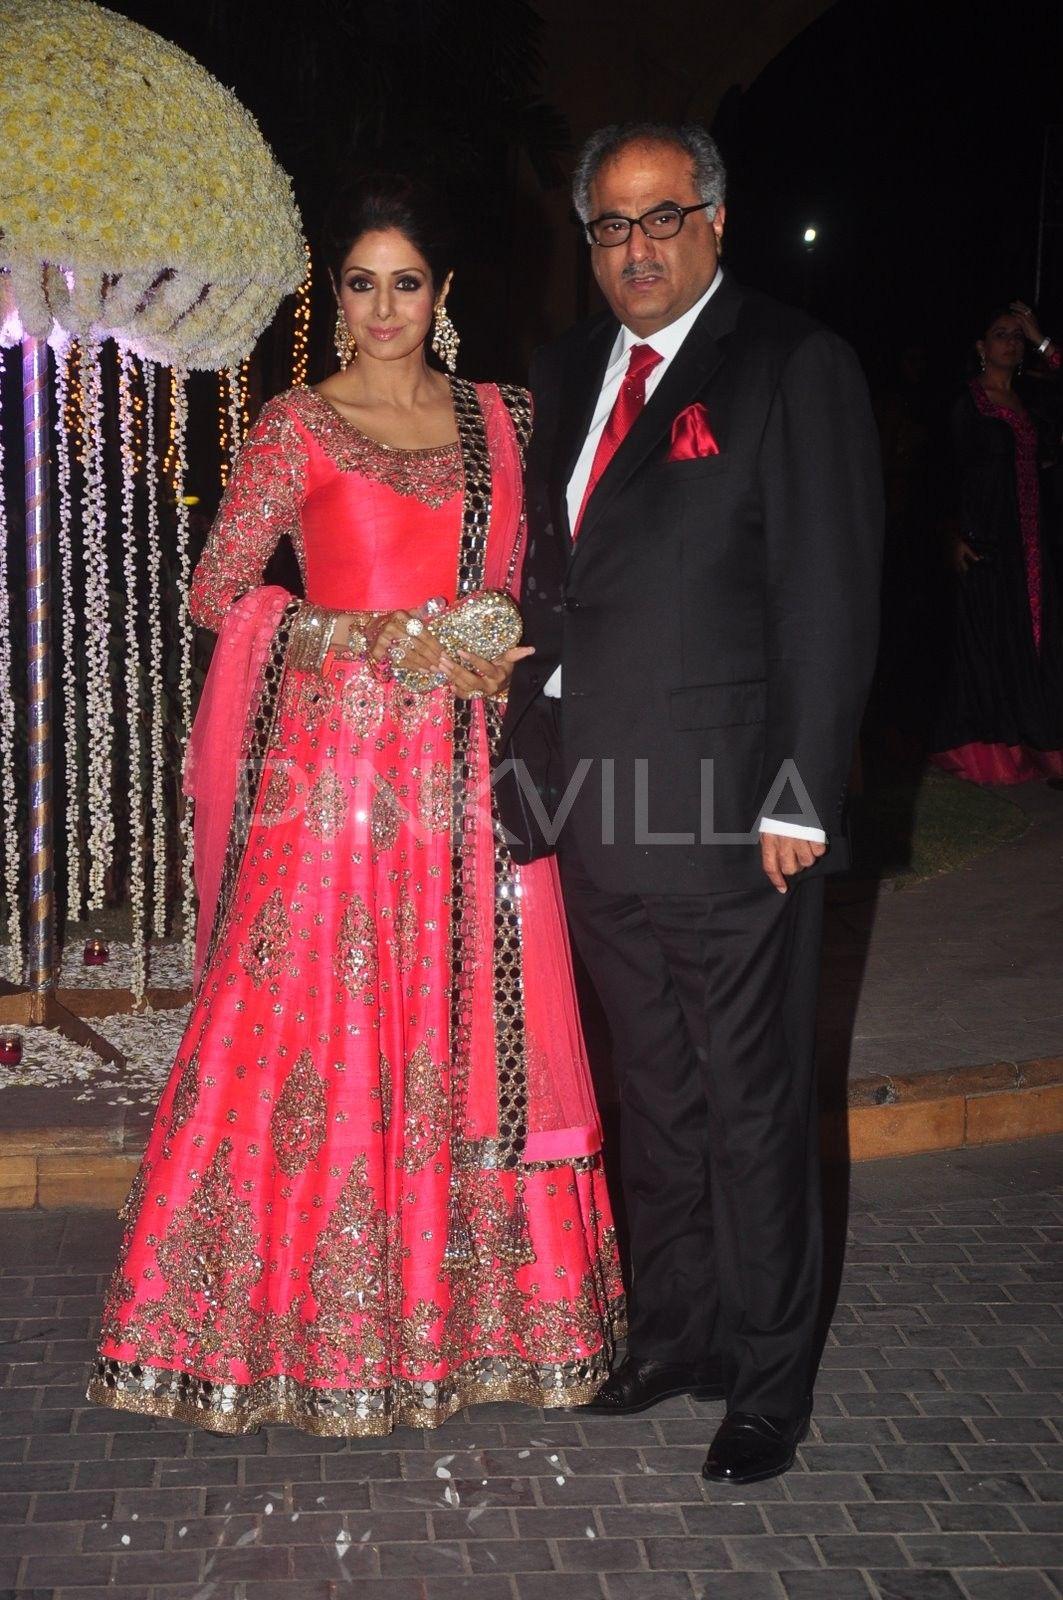 Sridevi and Juhi Chawla at Rriddhi Malhotra's wedding